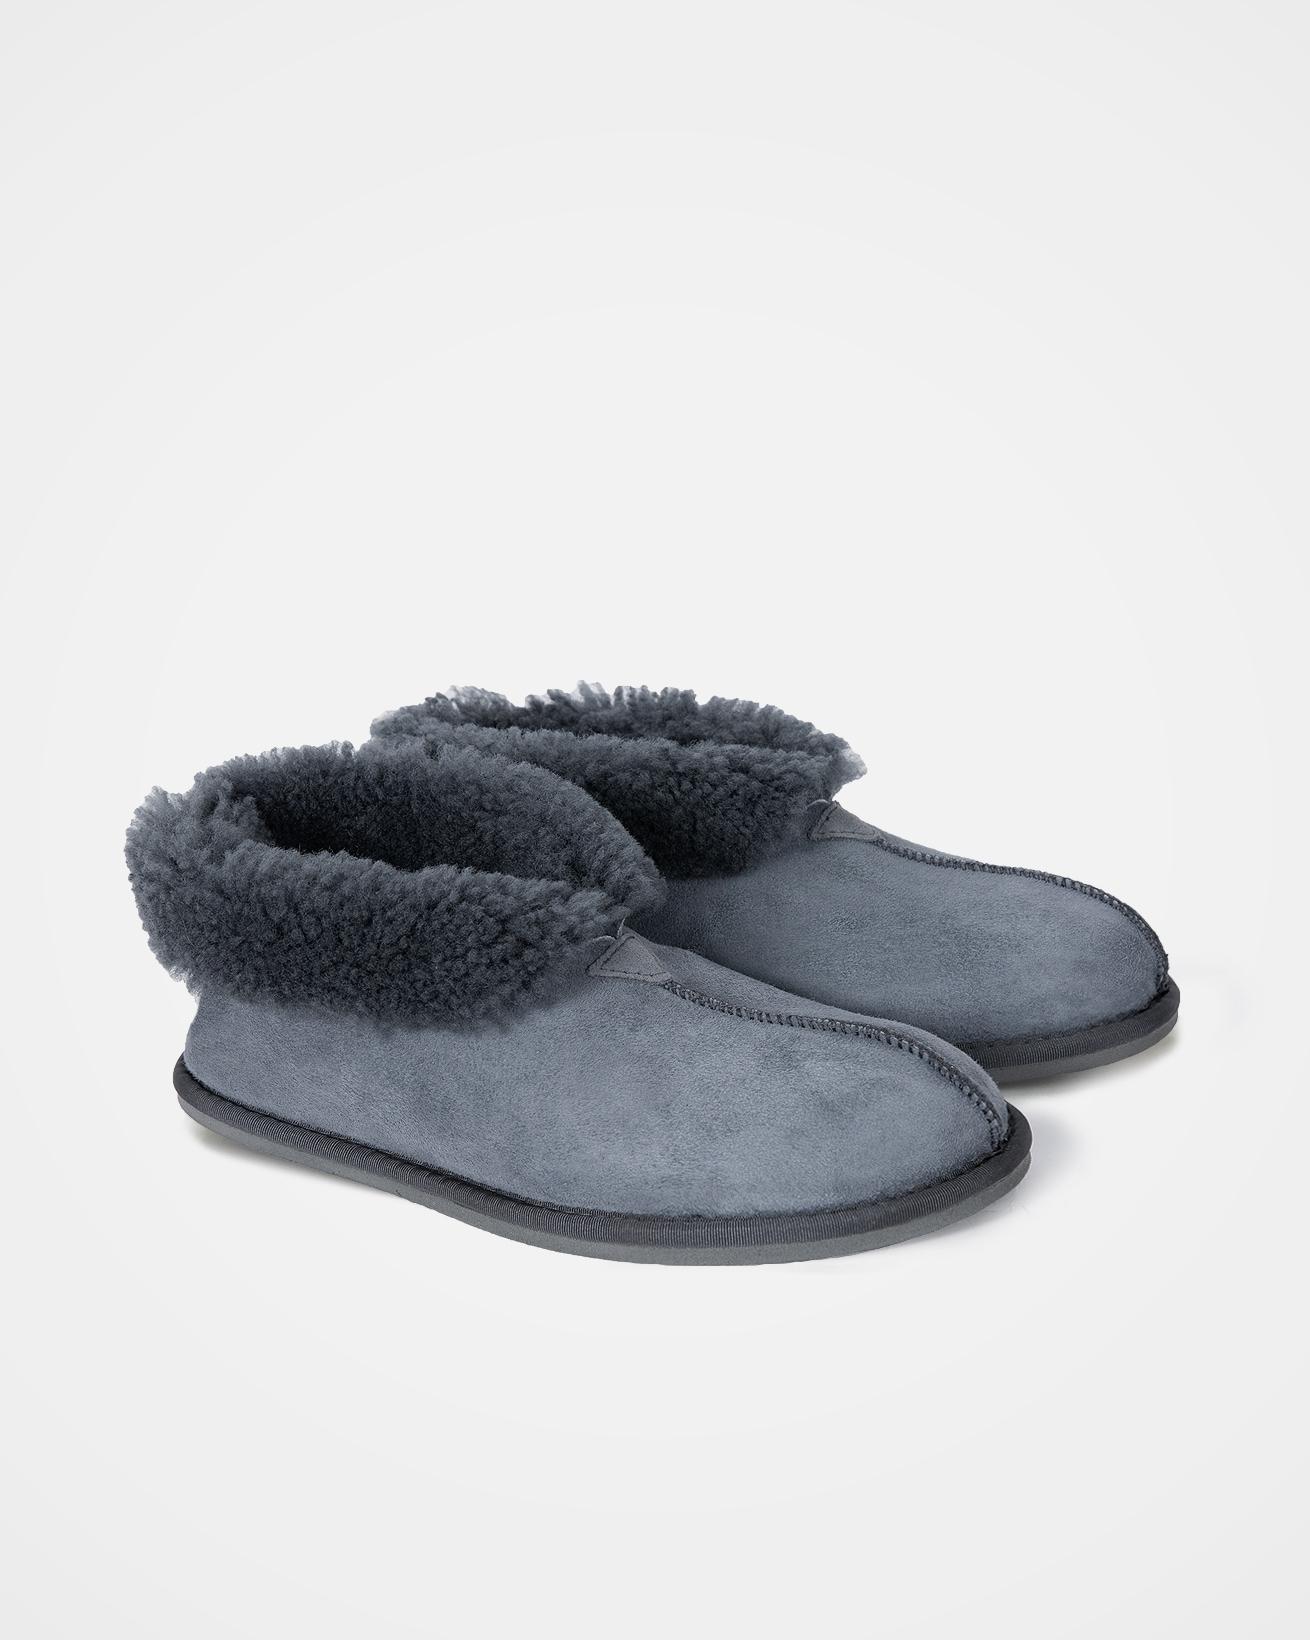 6618_mens sheepskin bootee slippers_pair.jpg